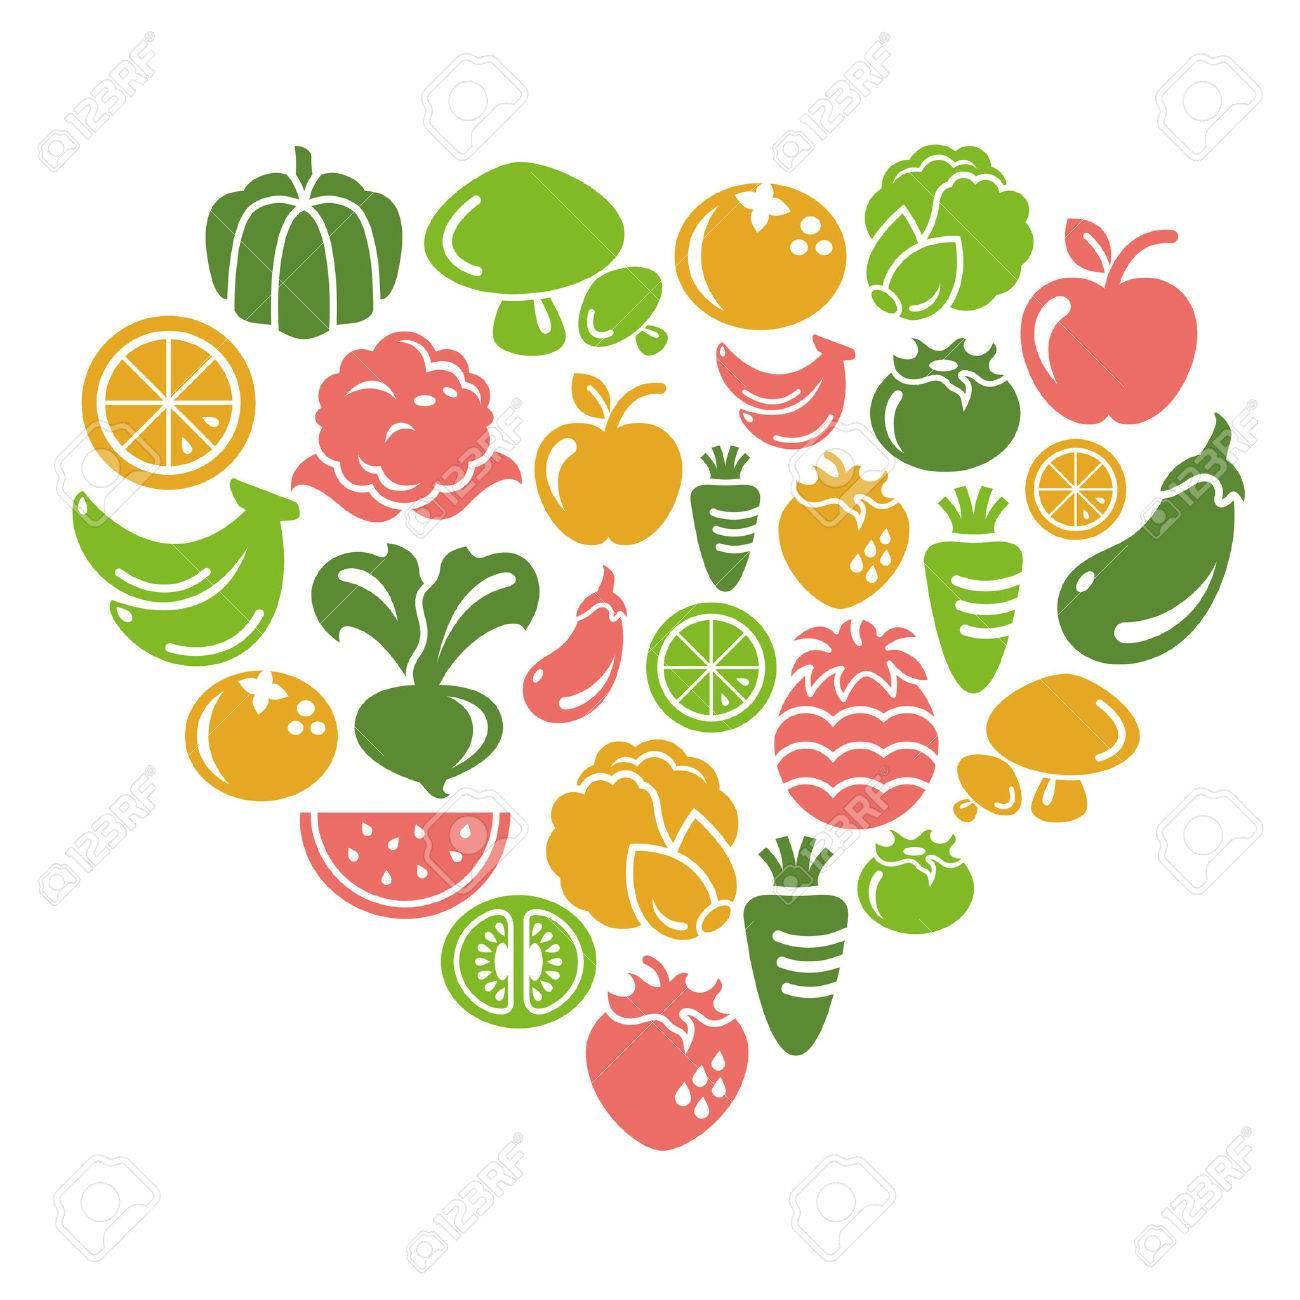 Hearts clipart vegetable. Heart clip art fruit